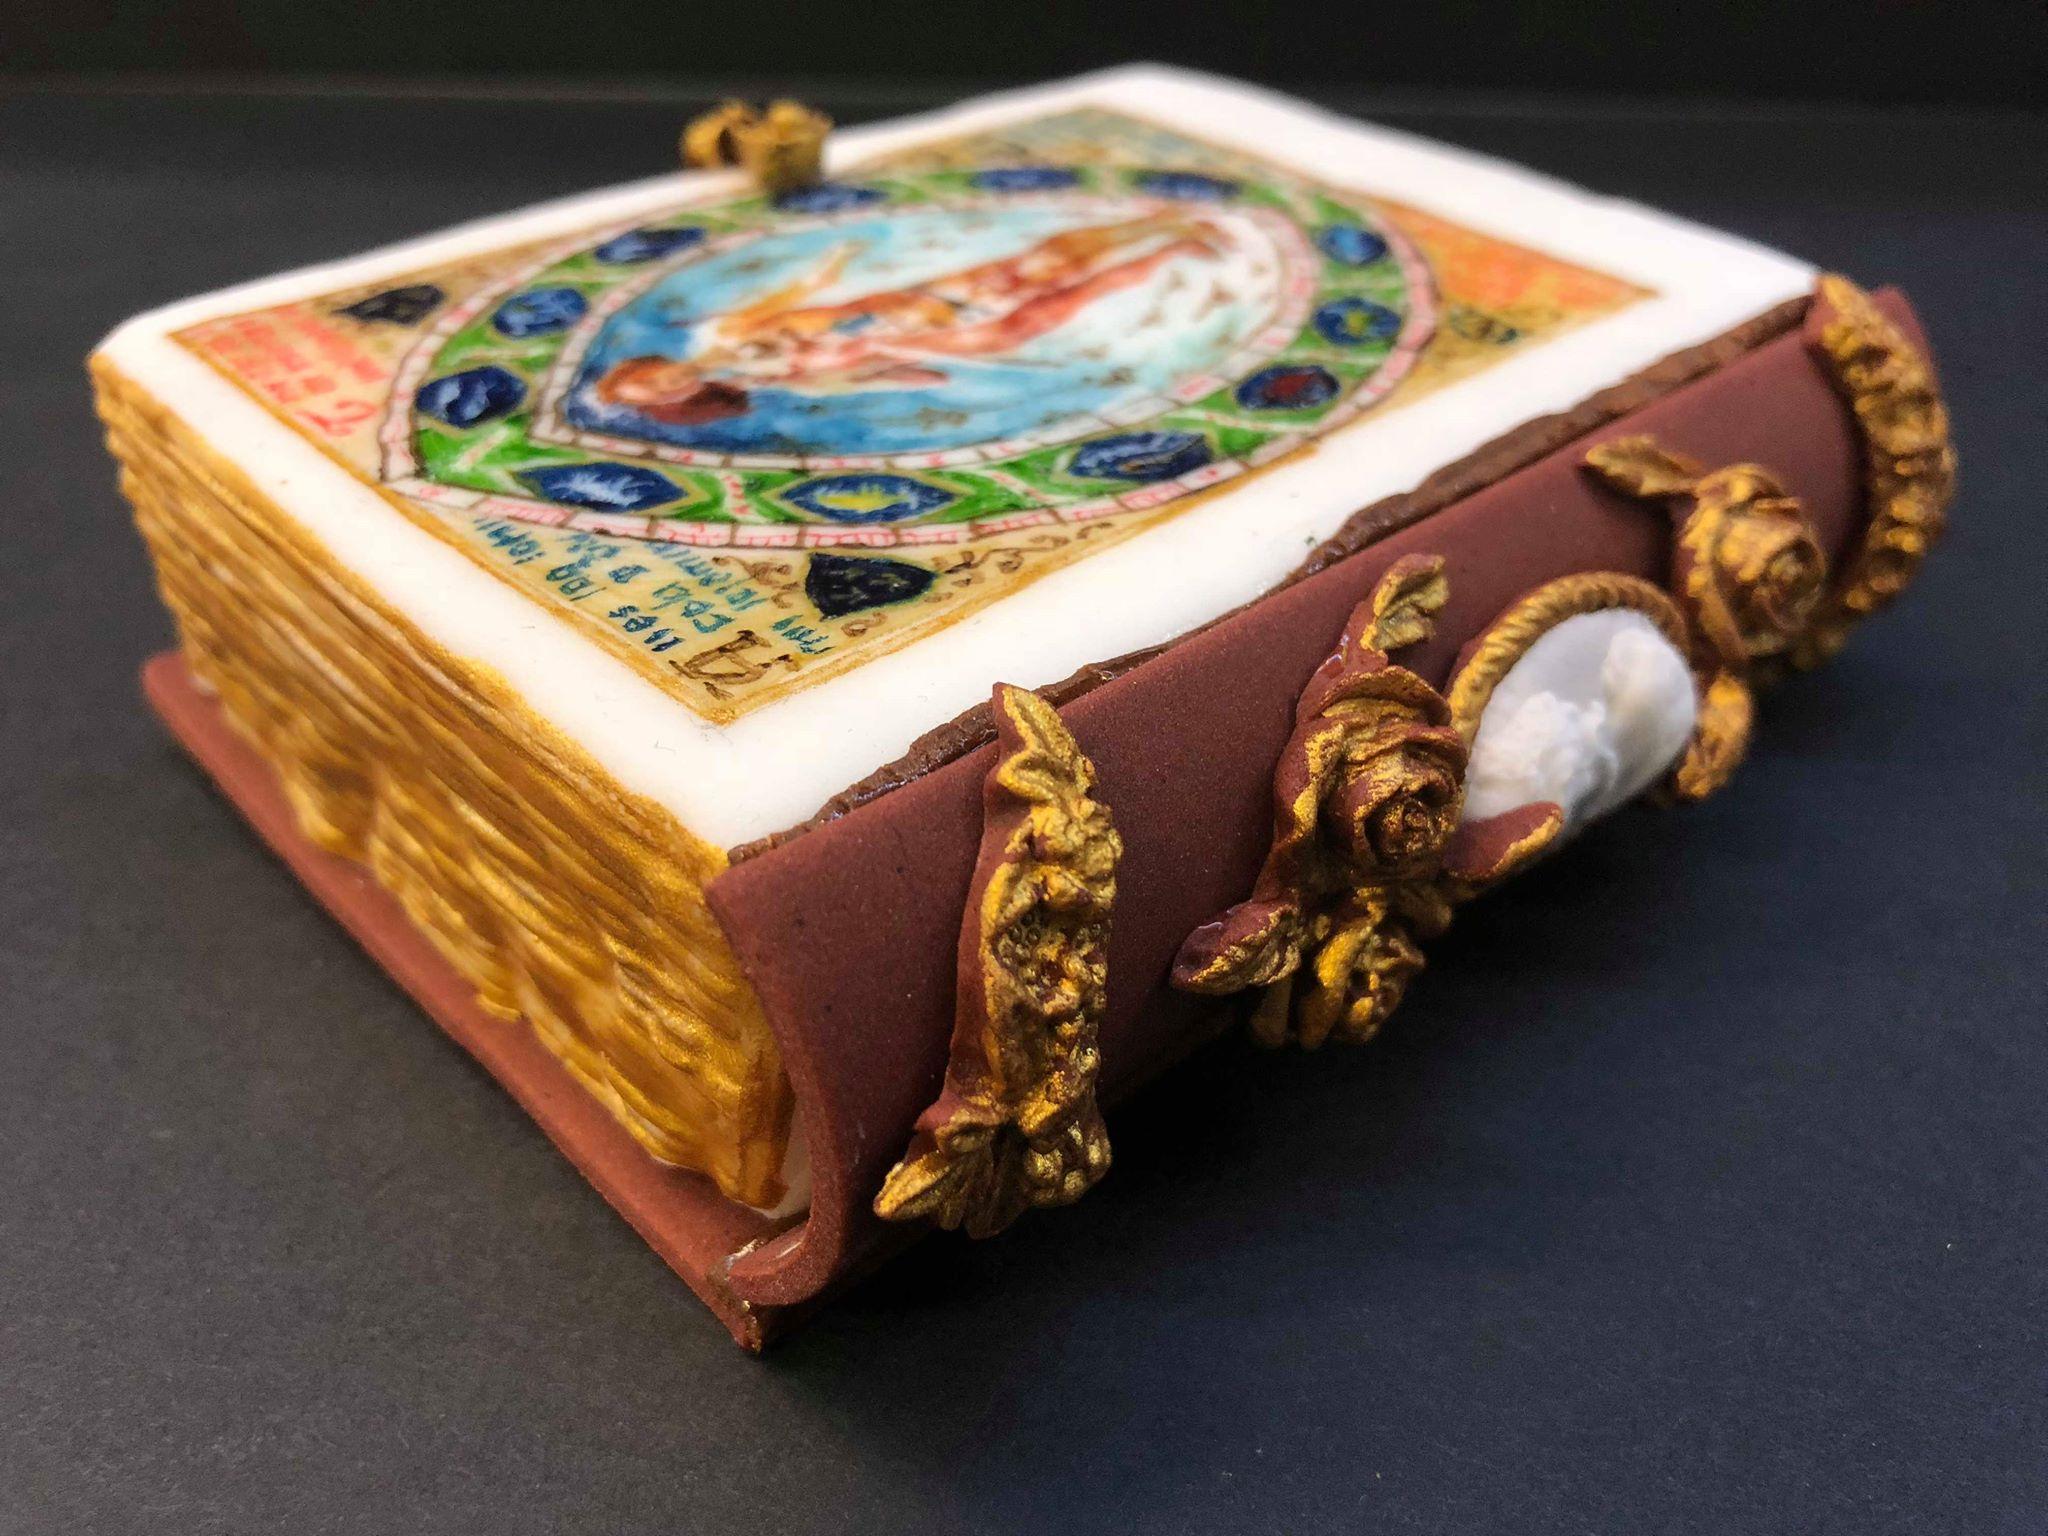 sweet-art-gifts-2910 (11)